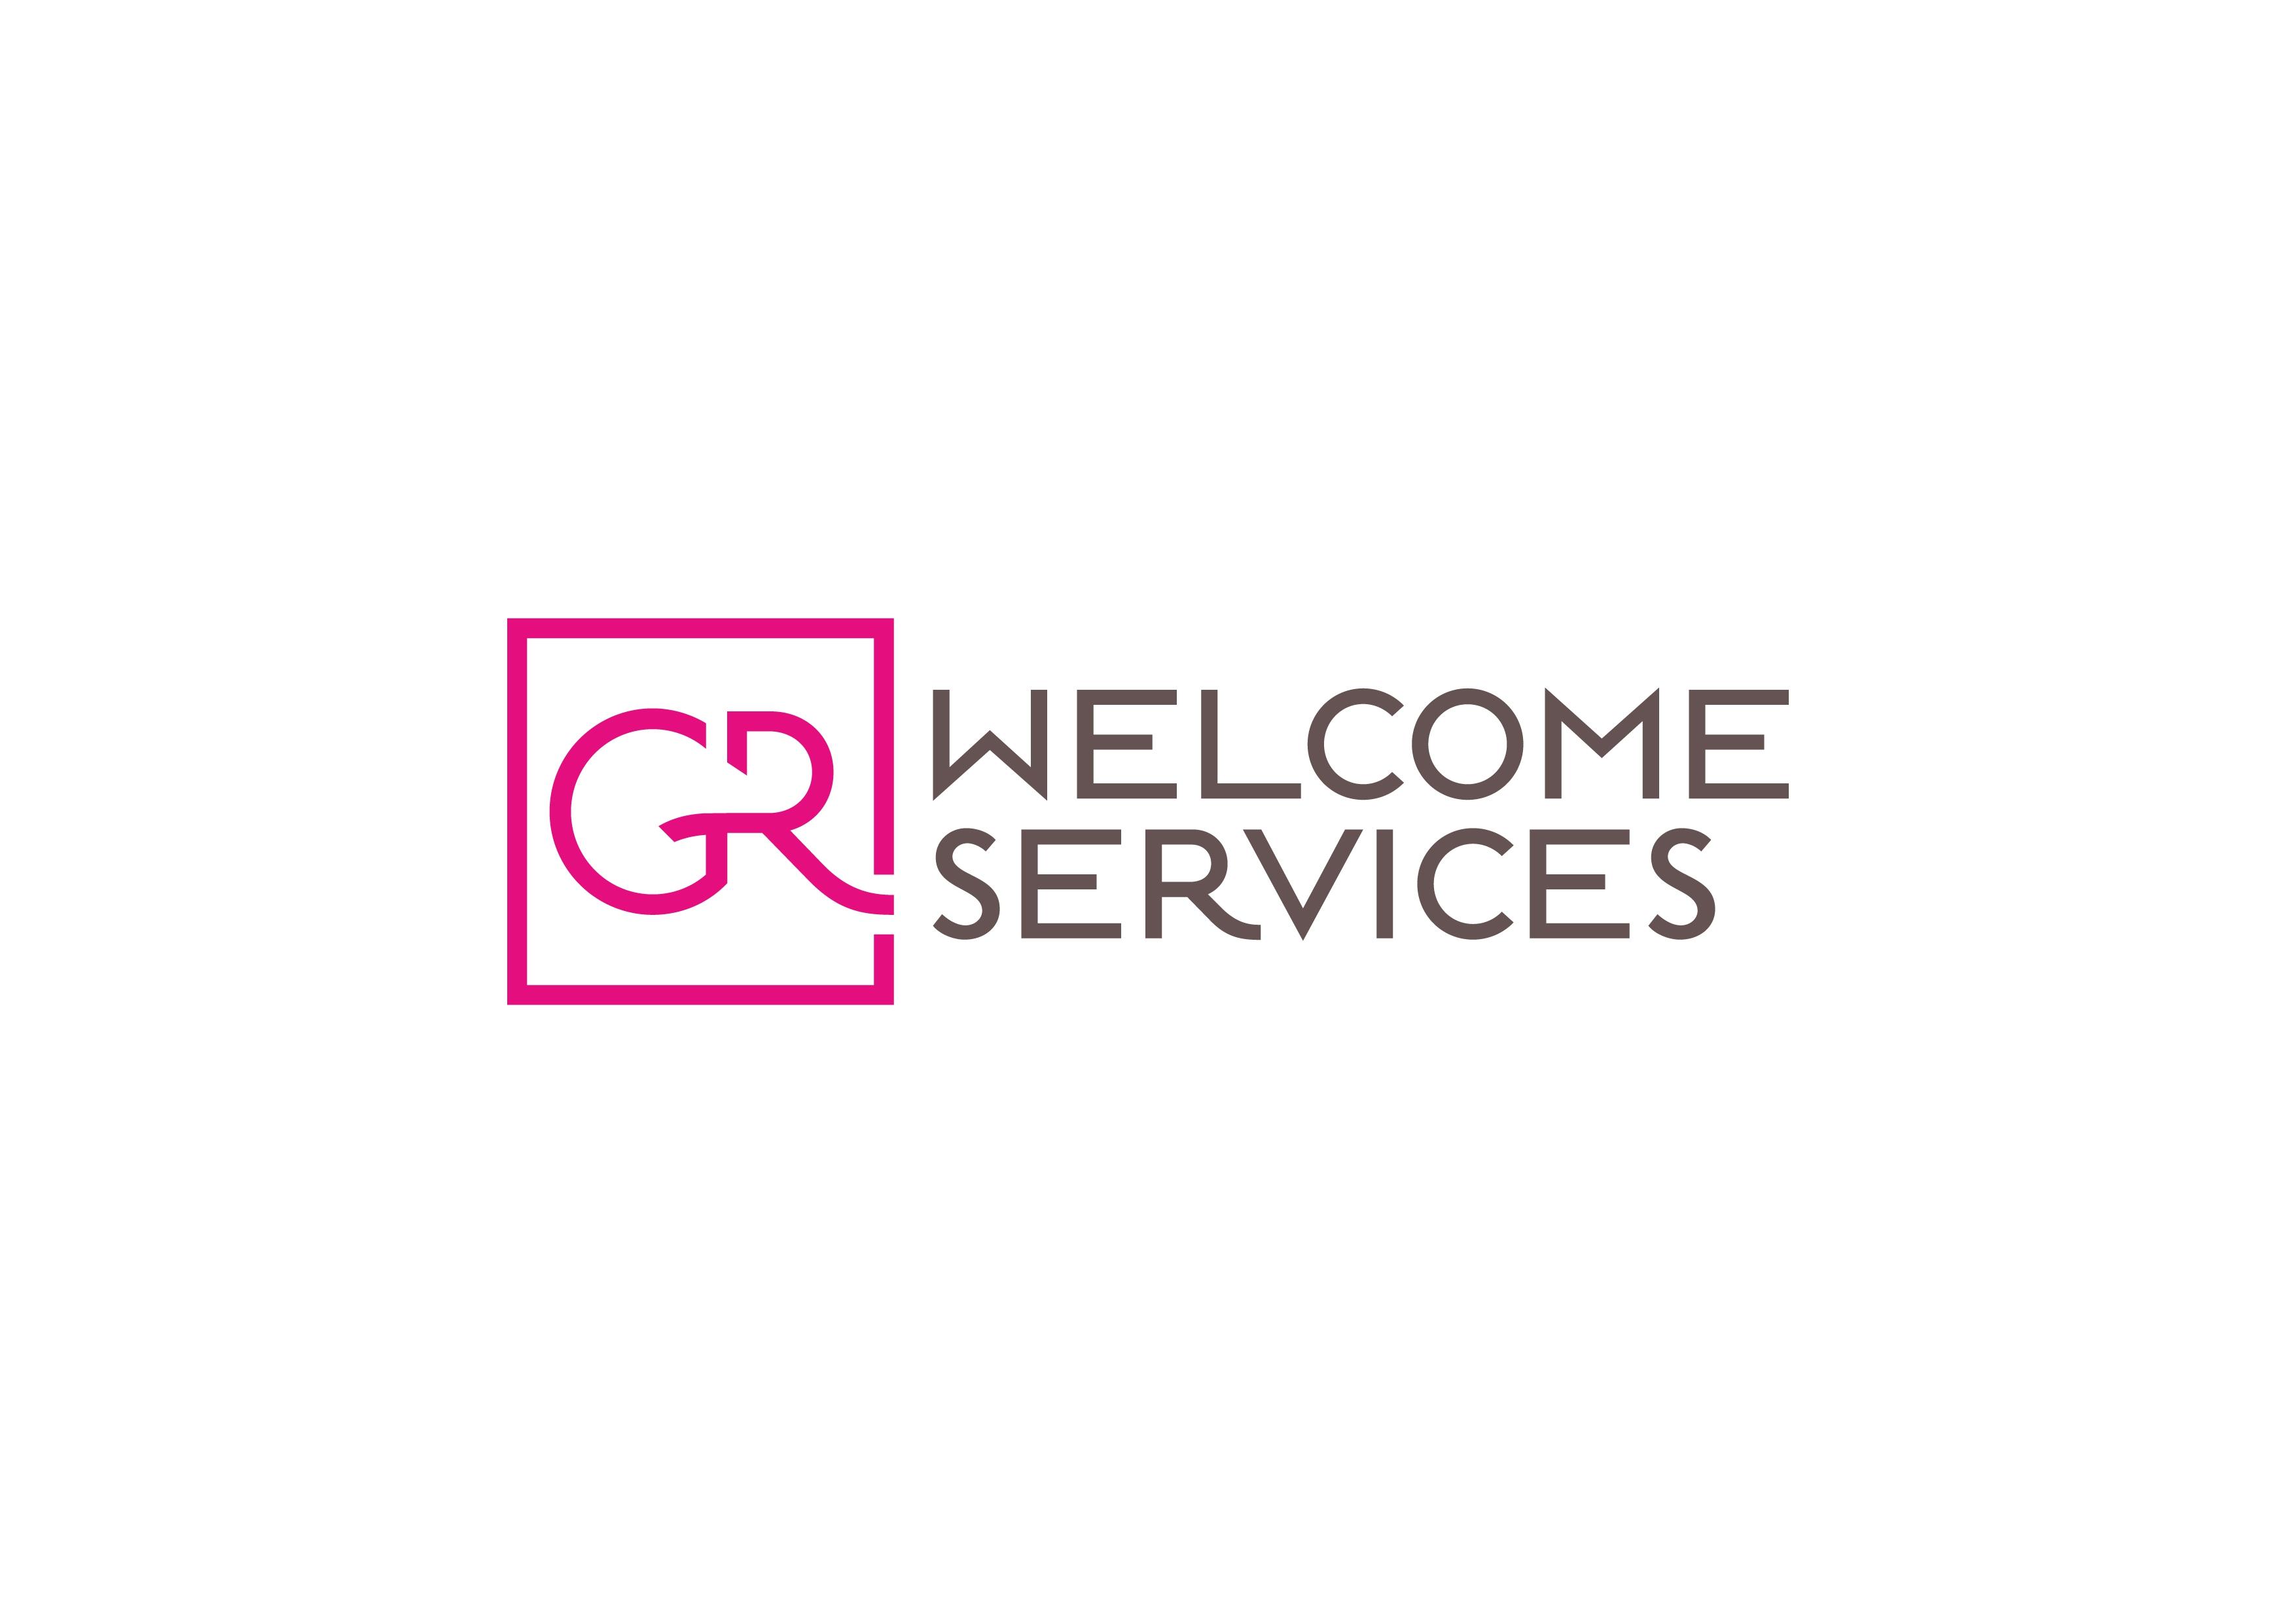 GR International Profiles